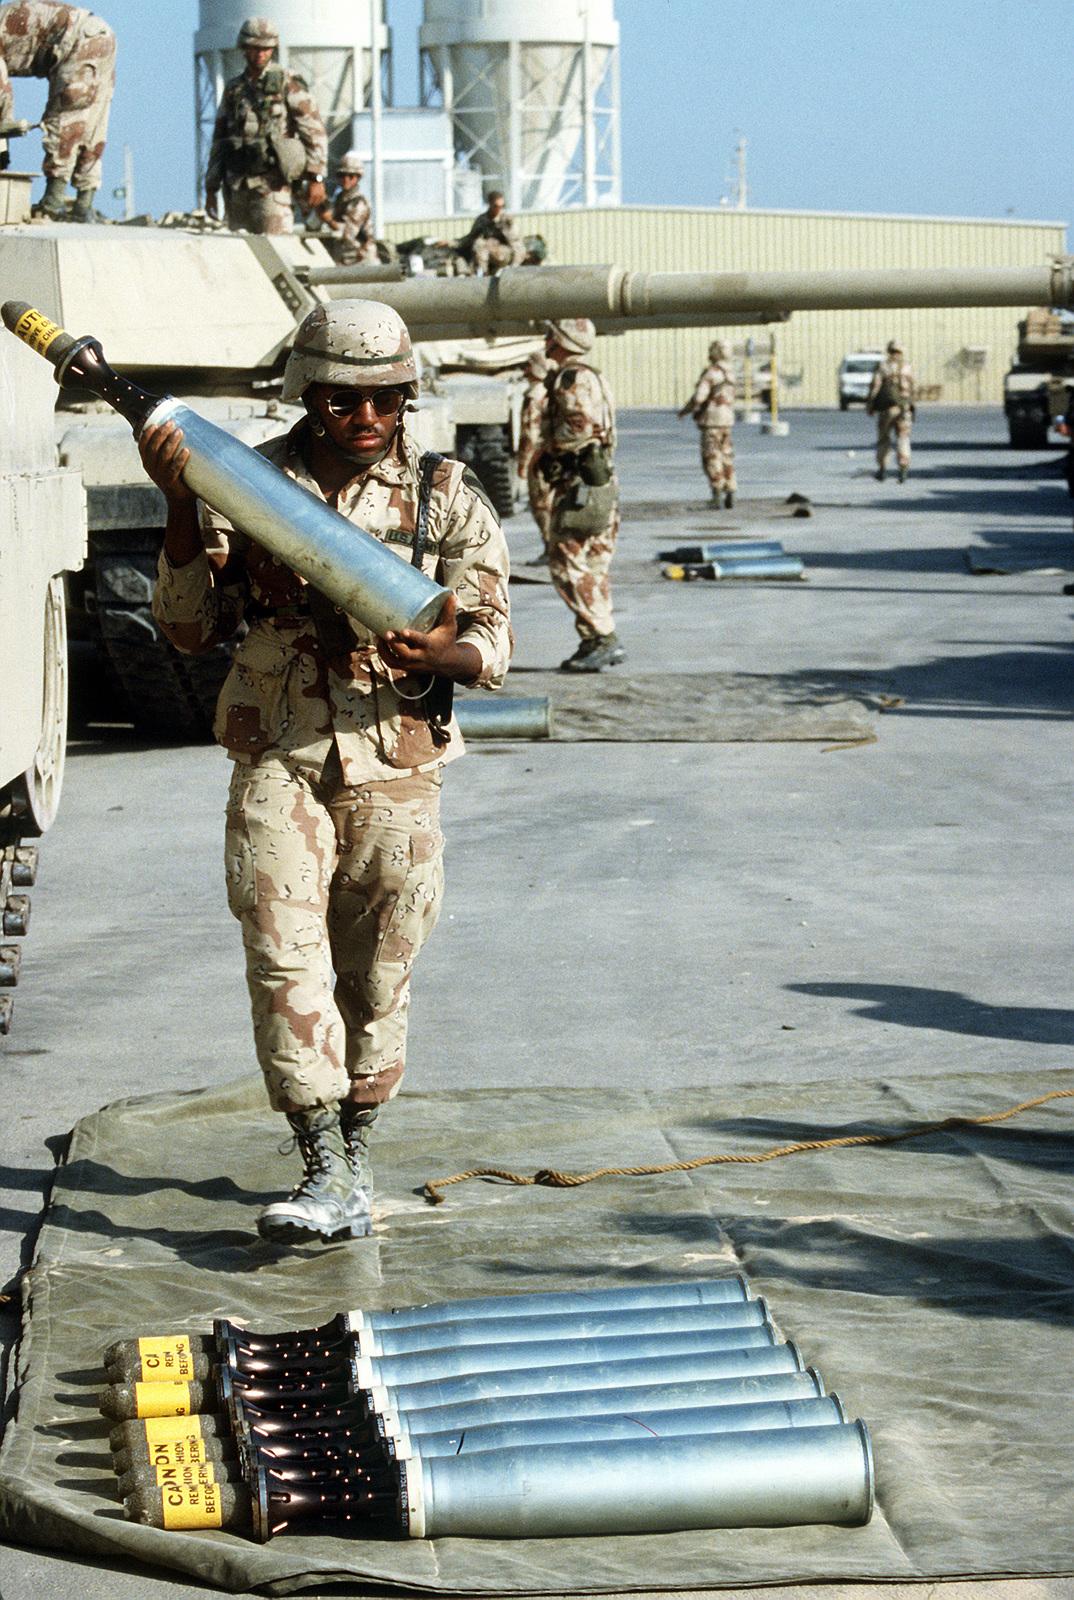 An ammunition specialist carries a 105mm armor-piercing